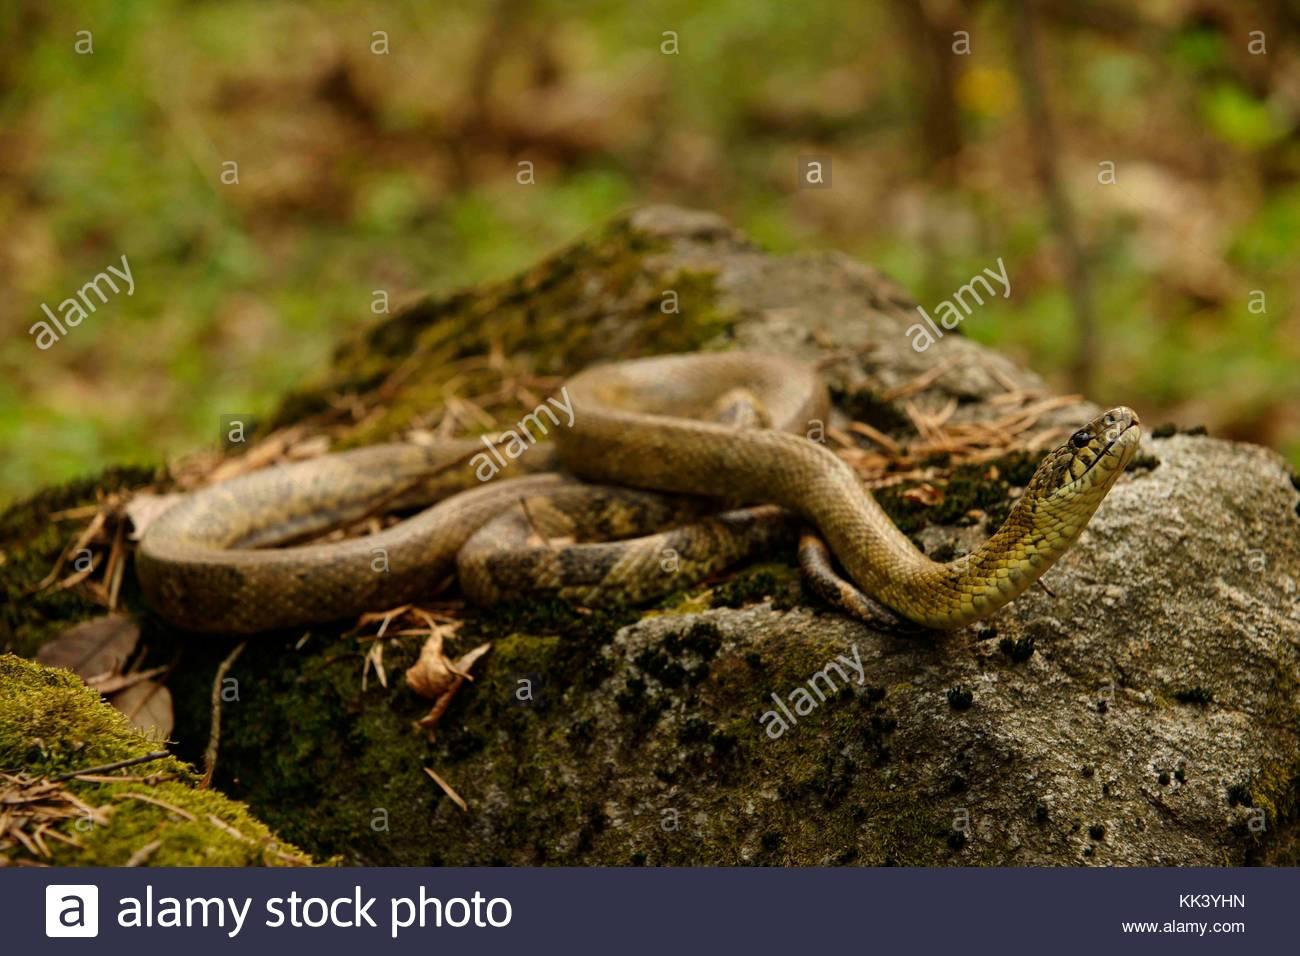 kind of yellow serpent Korea National Arboretum Gwangneung Arboretum - Stock Image